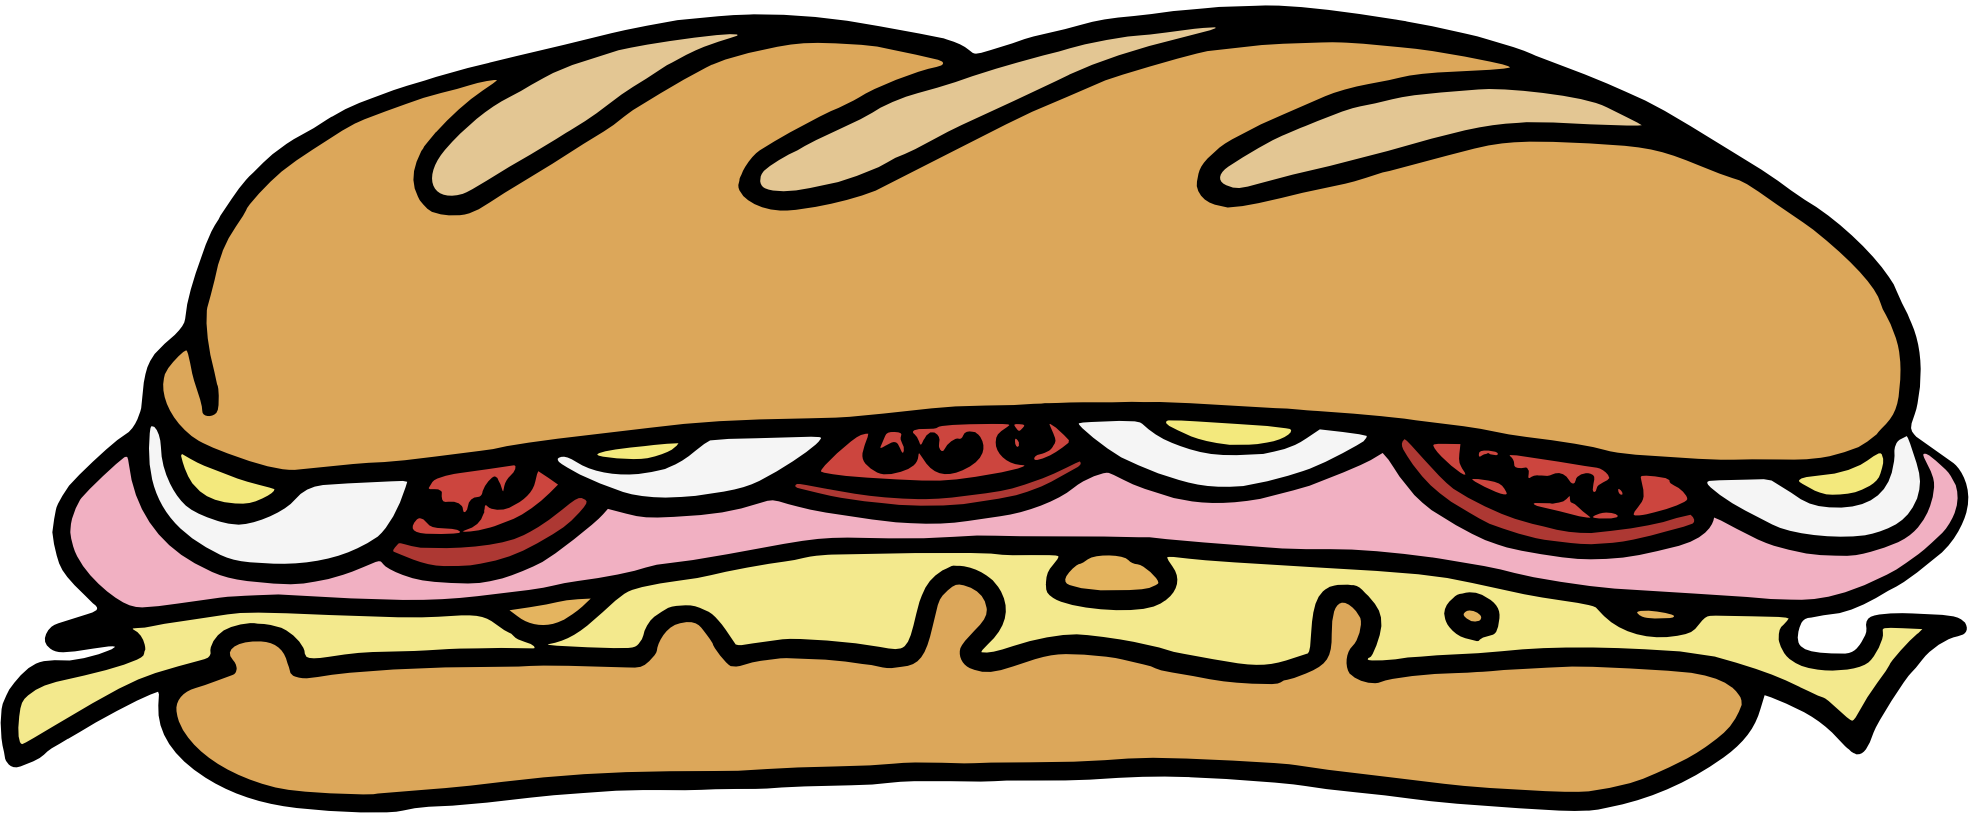 sandwich clipart clipart panda free clipart images Meatball Sub Sandwich Clip Art Cartoon Sub Sandwich